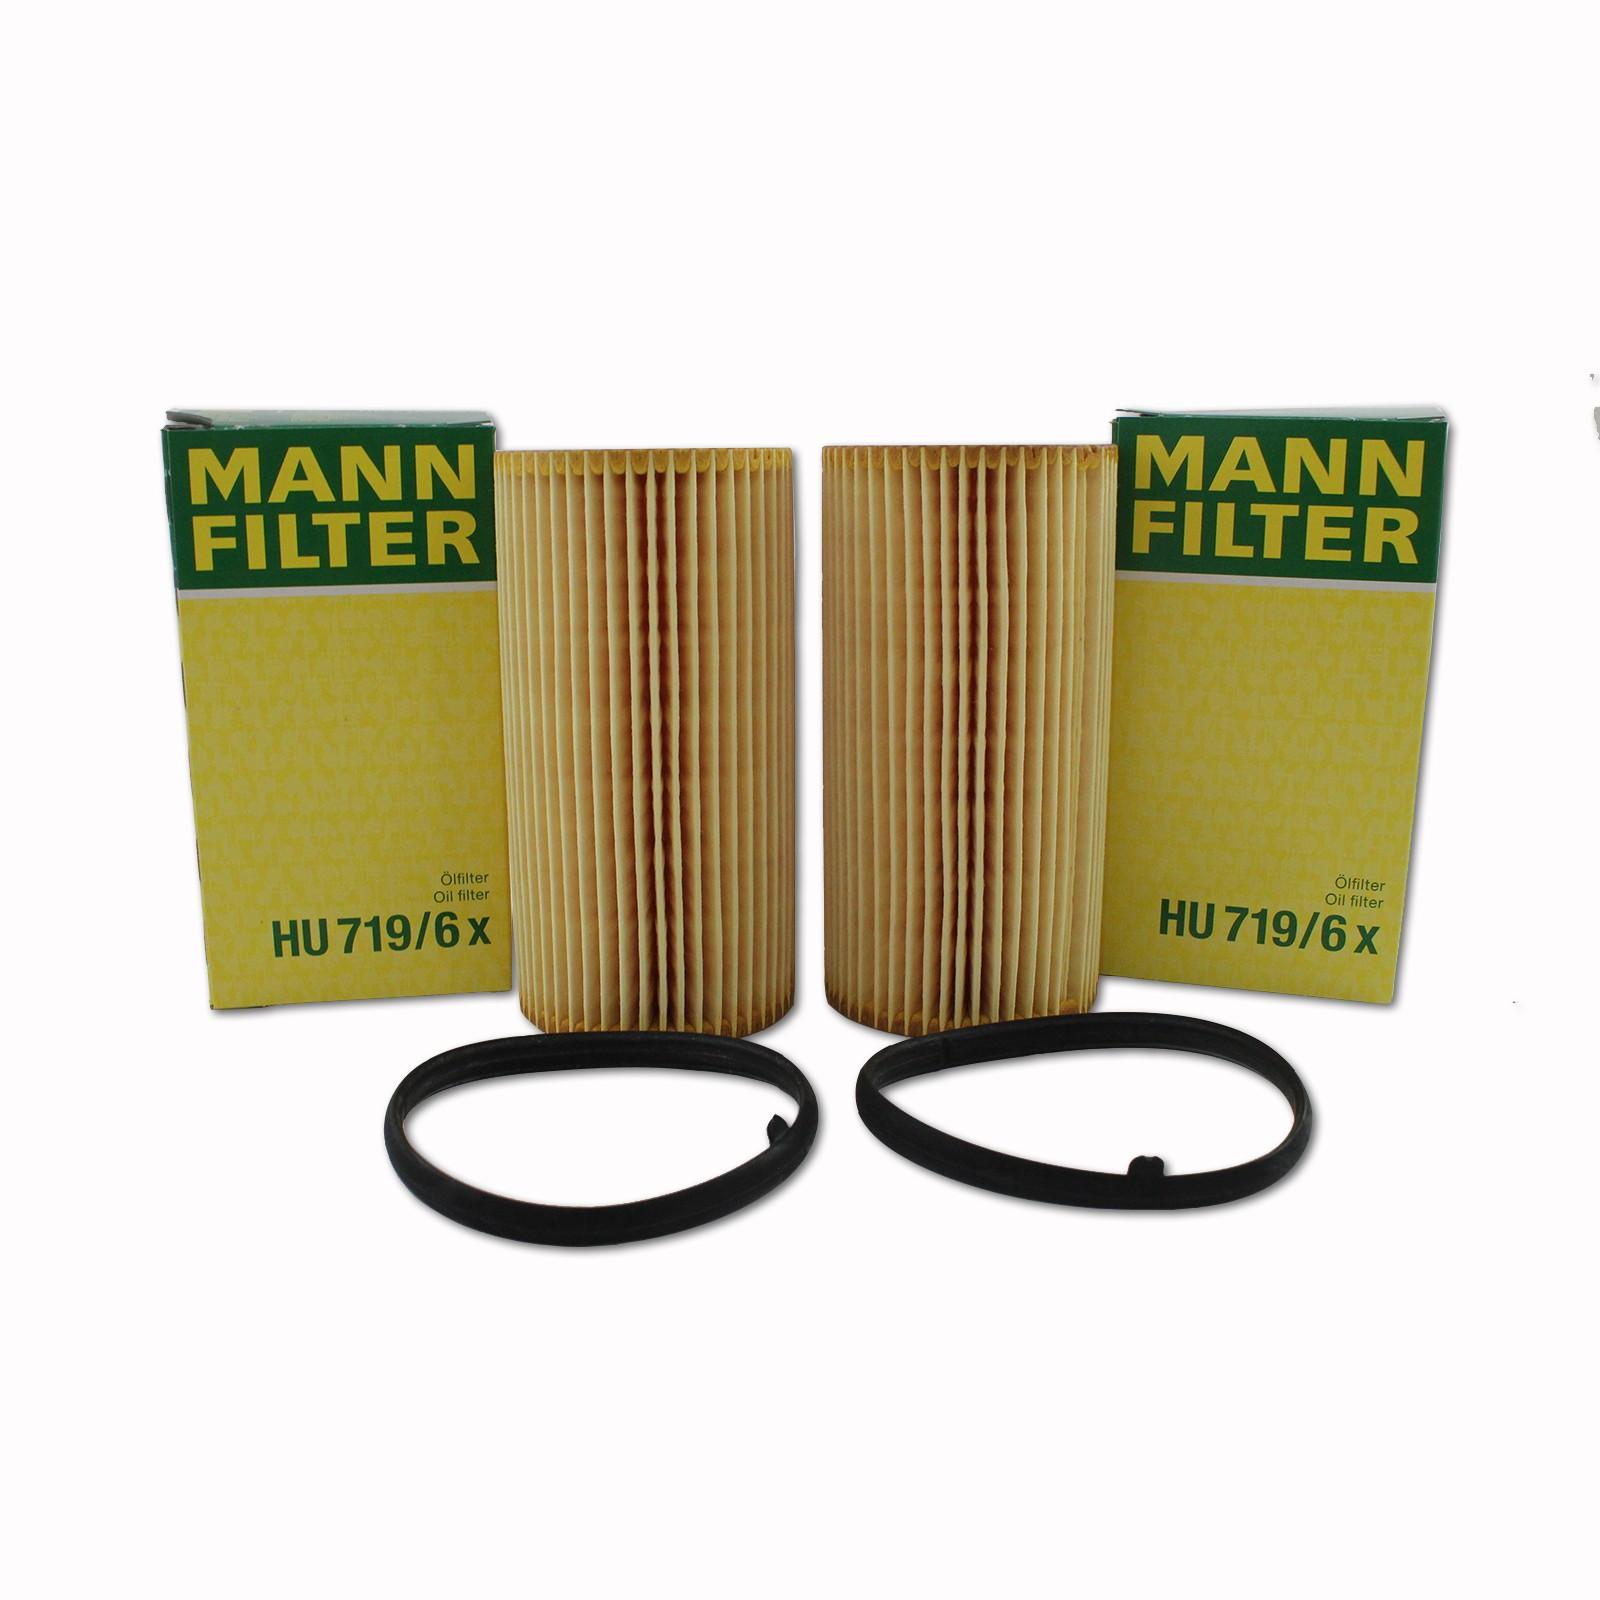 oil filter mann hu719/6x audi a3 a4 b6 b7 1.8t vw golf ... 1 8t fuel filter mann 1.8t fuel diagram